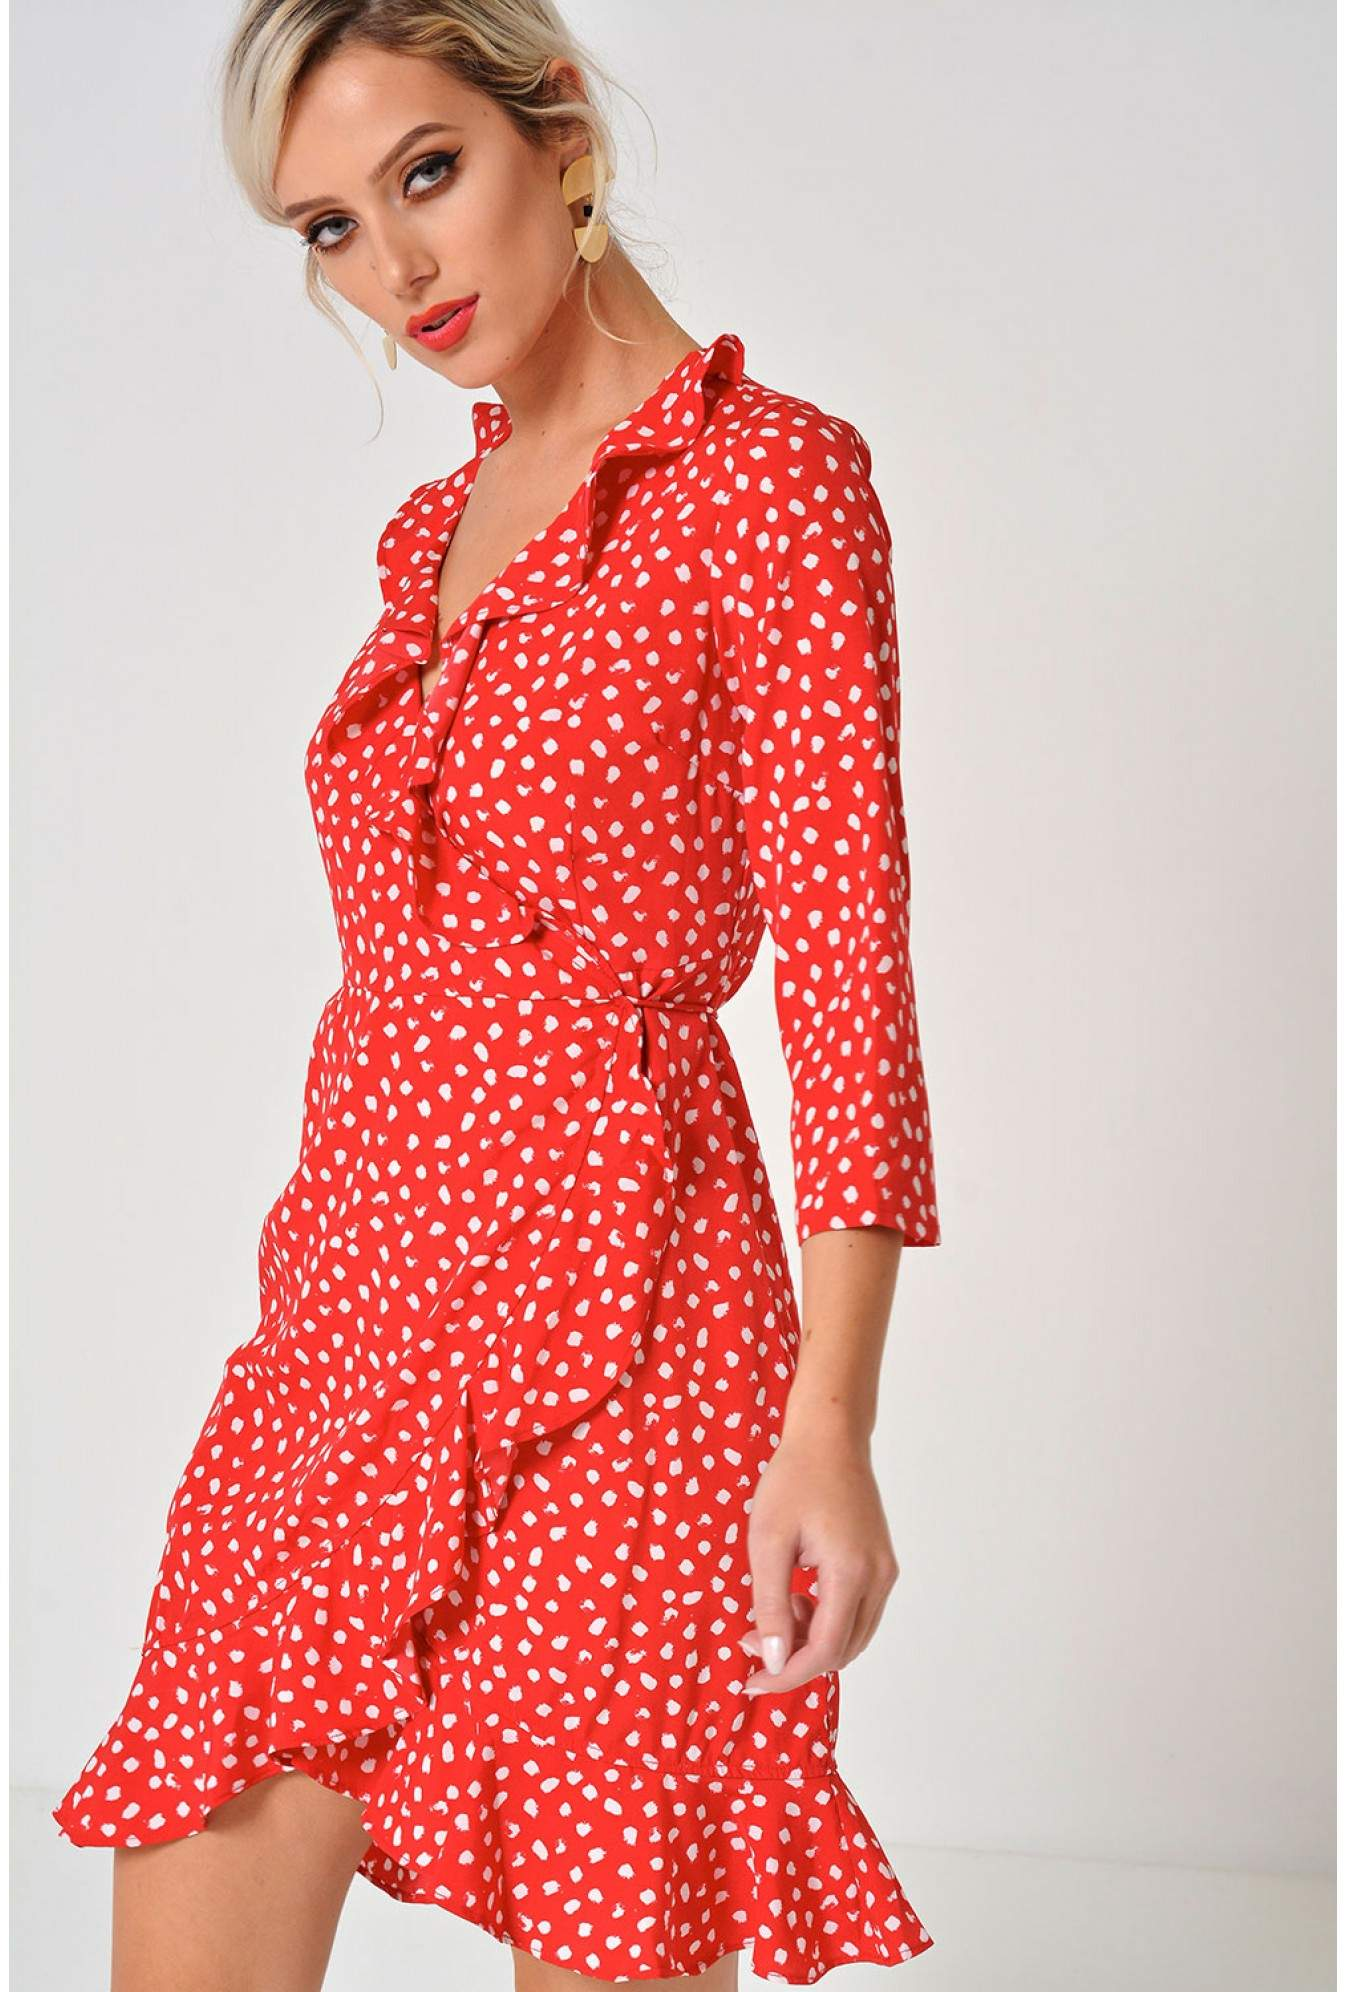 f49aaba04cd5 More Views. Henna Polka Dot Wrap Dress in Red. Vero Moda